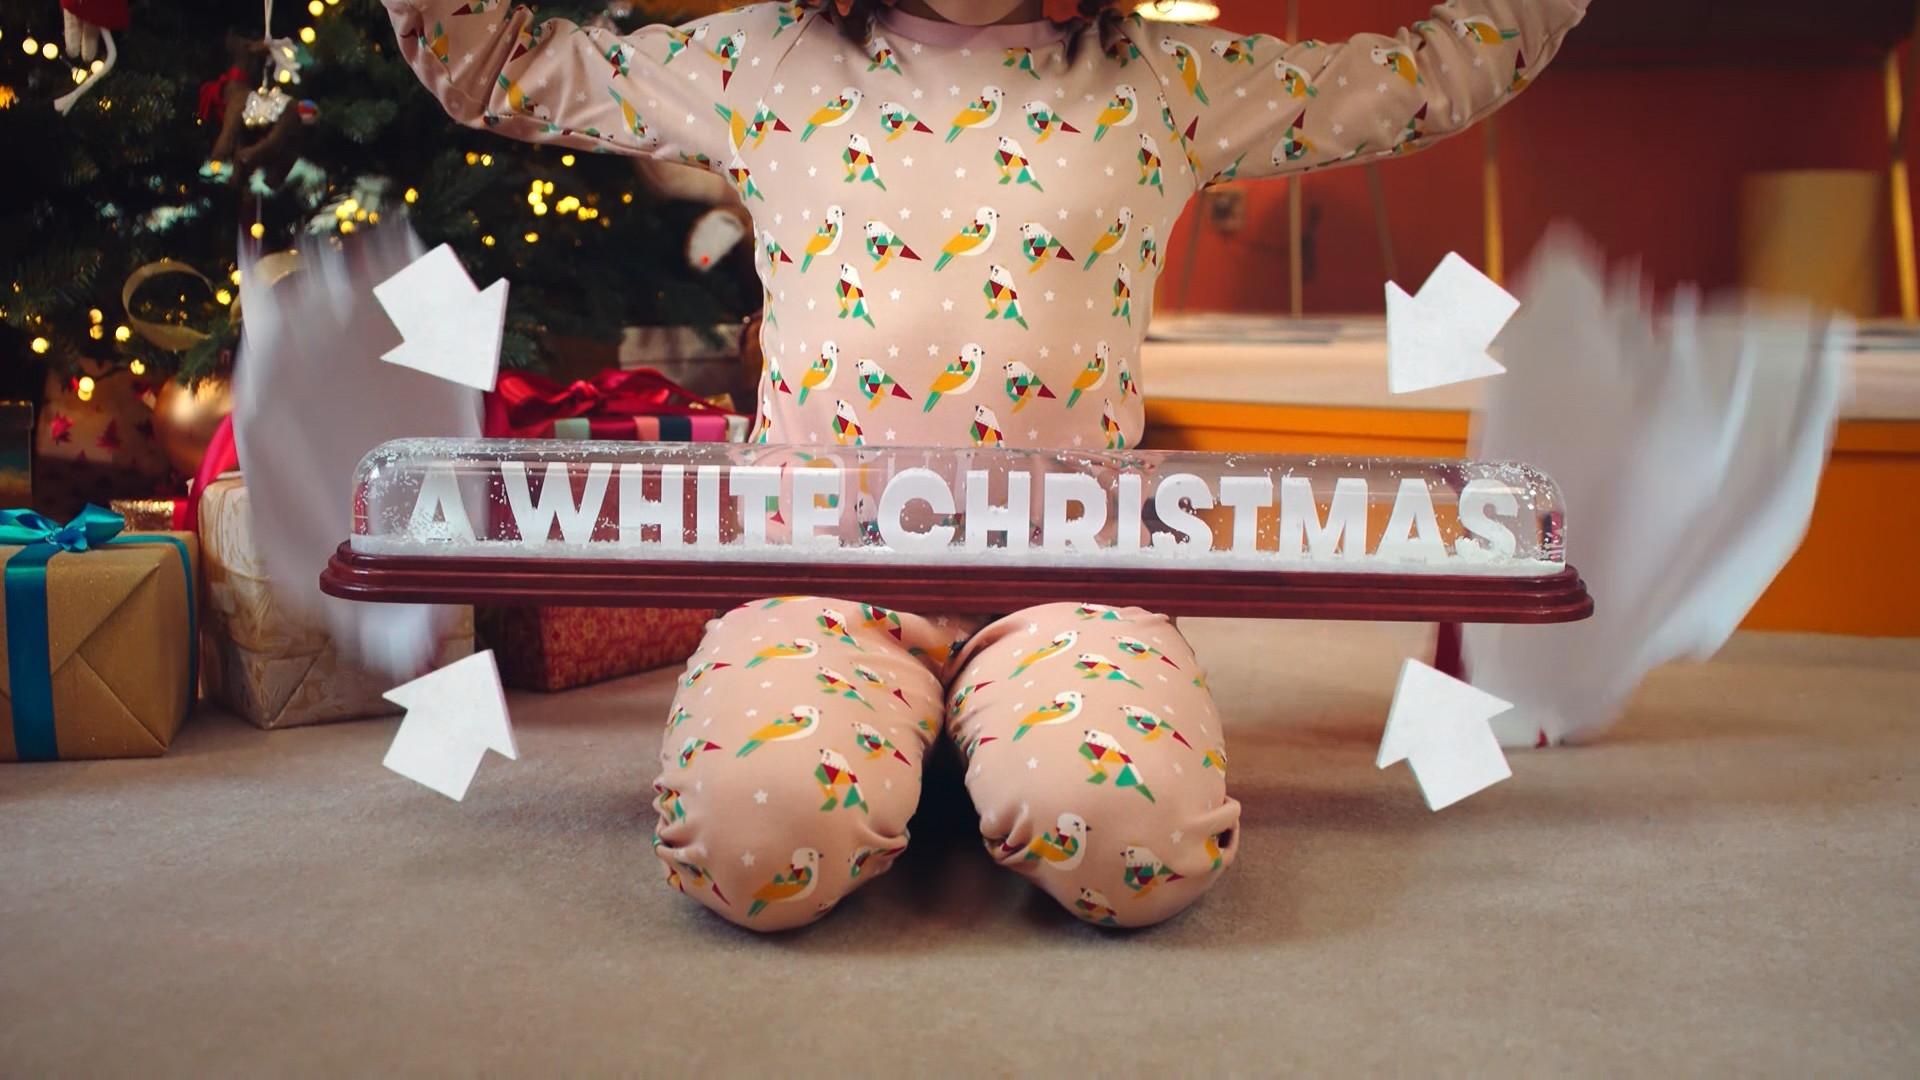 TK Maxx - White Christmas_1-0014